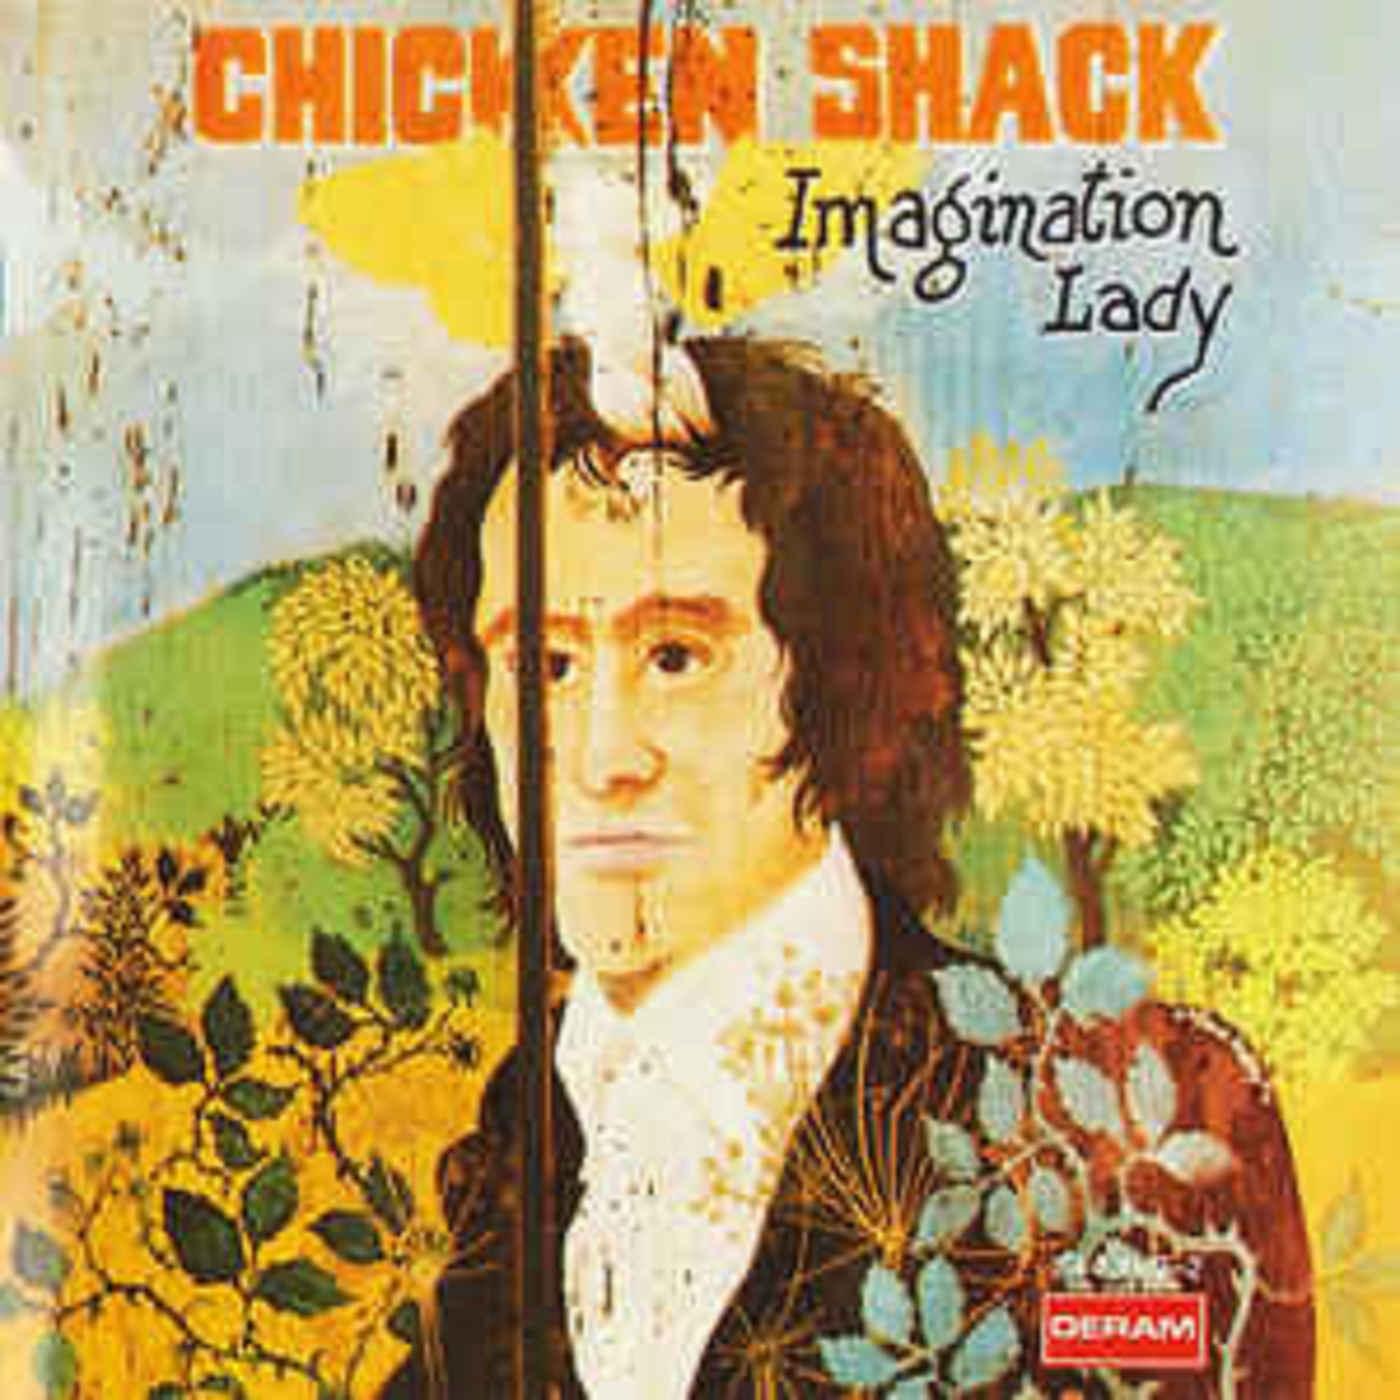 Imagination Lady, Remastered CD Edition + 2 bonus tracks